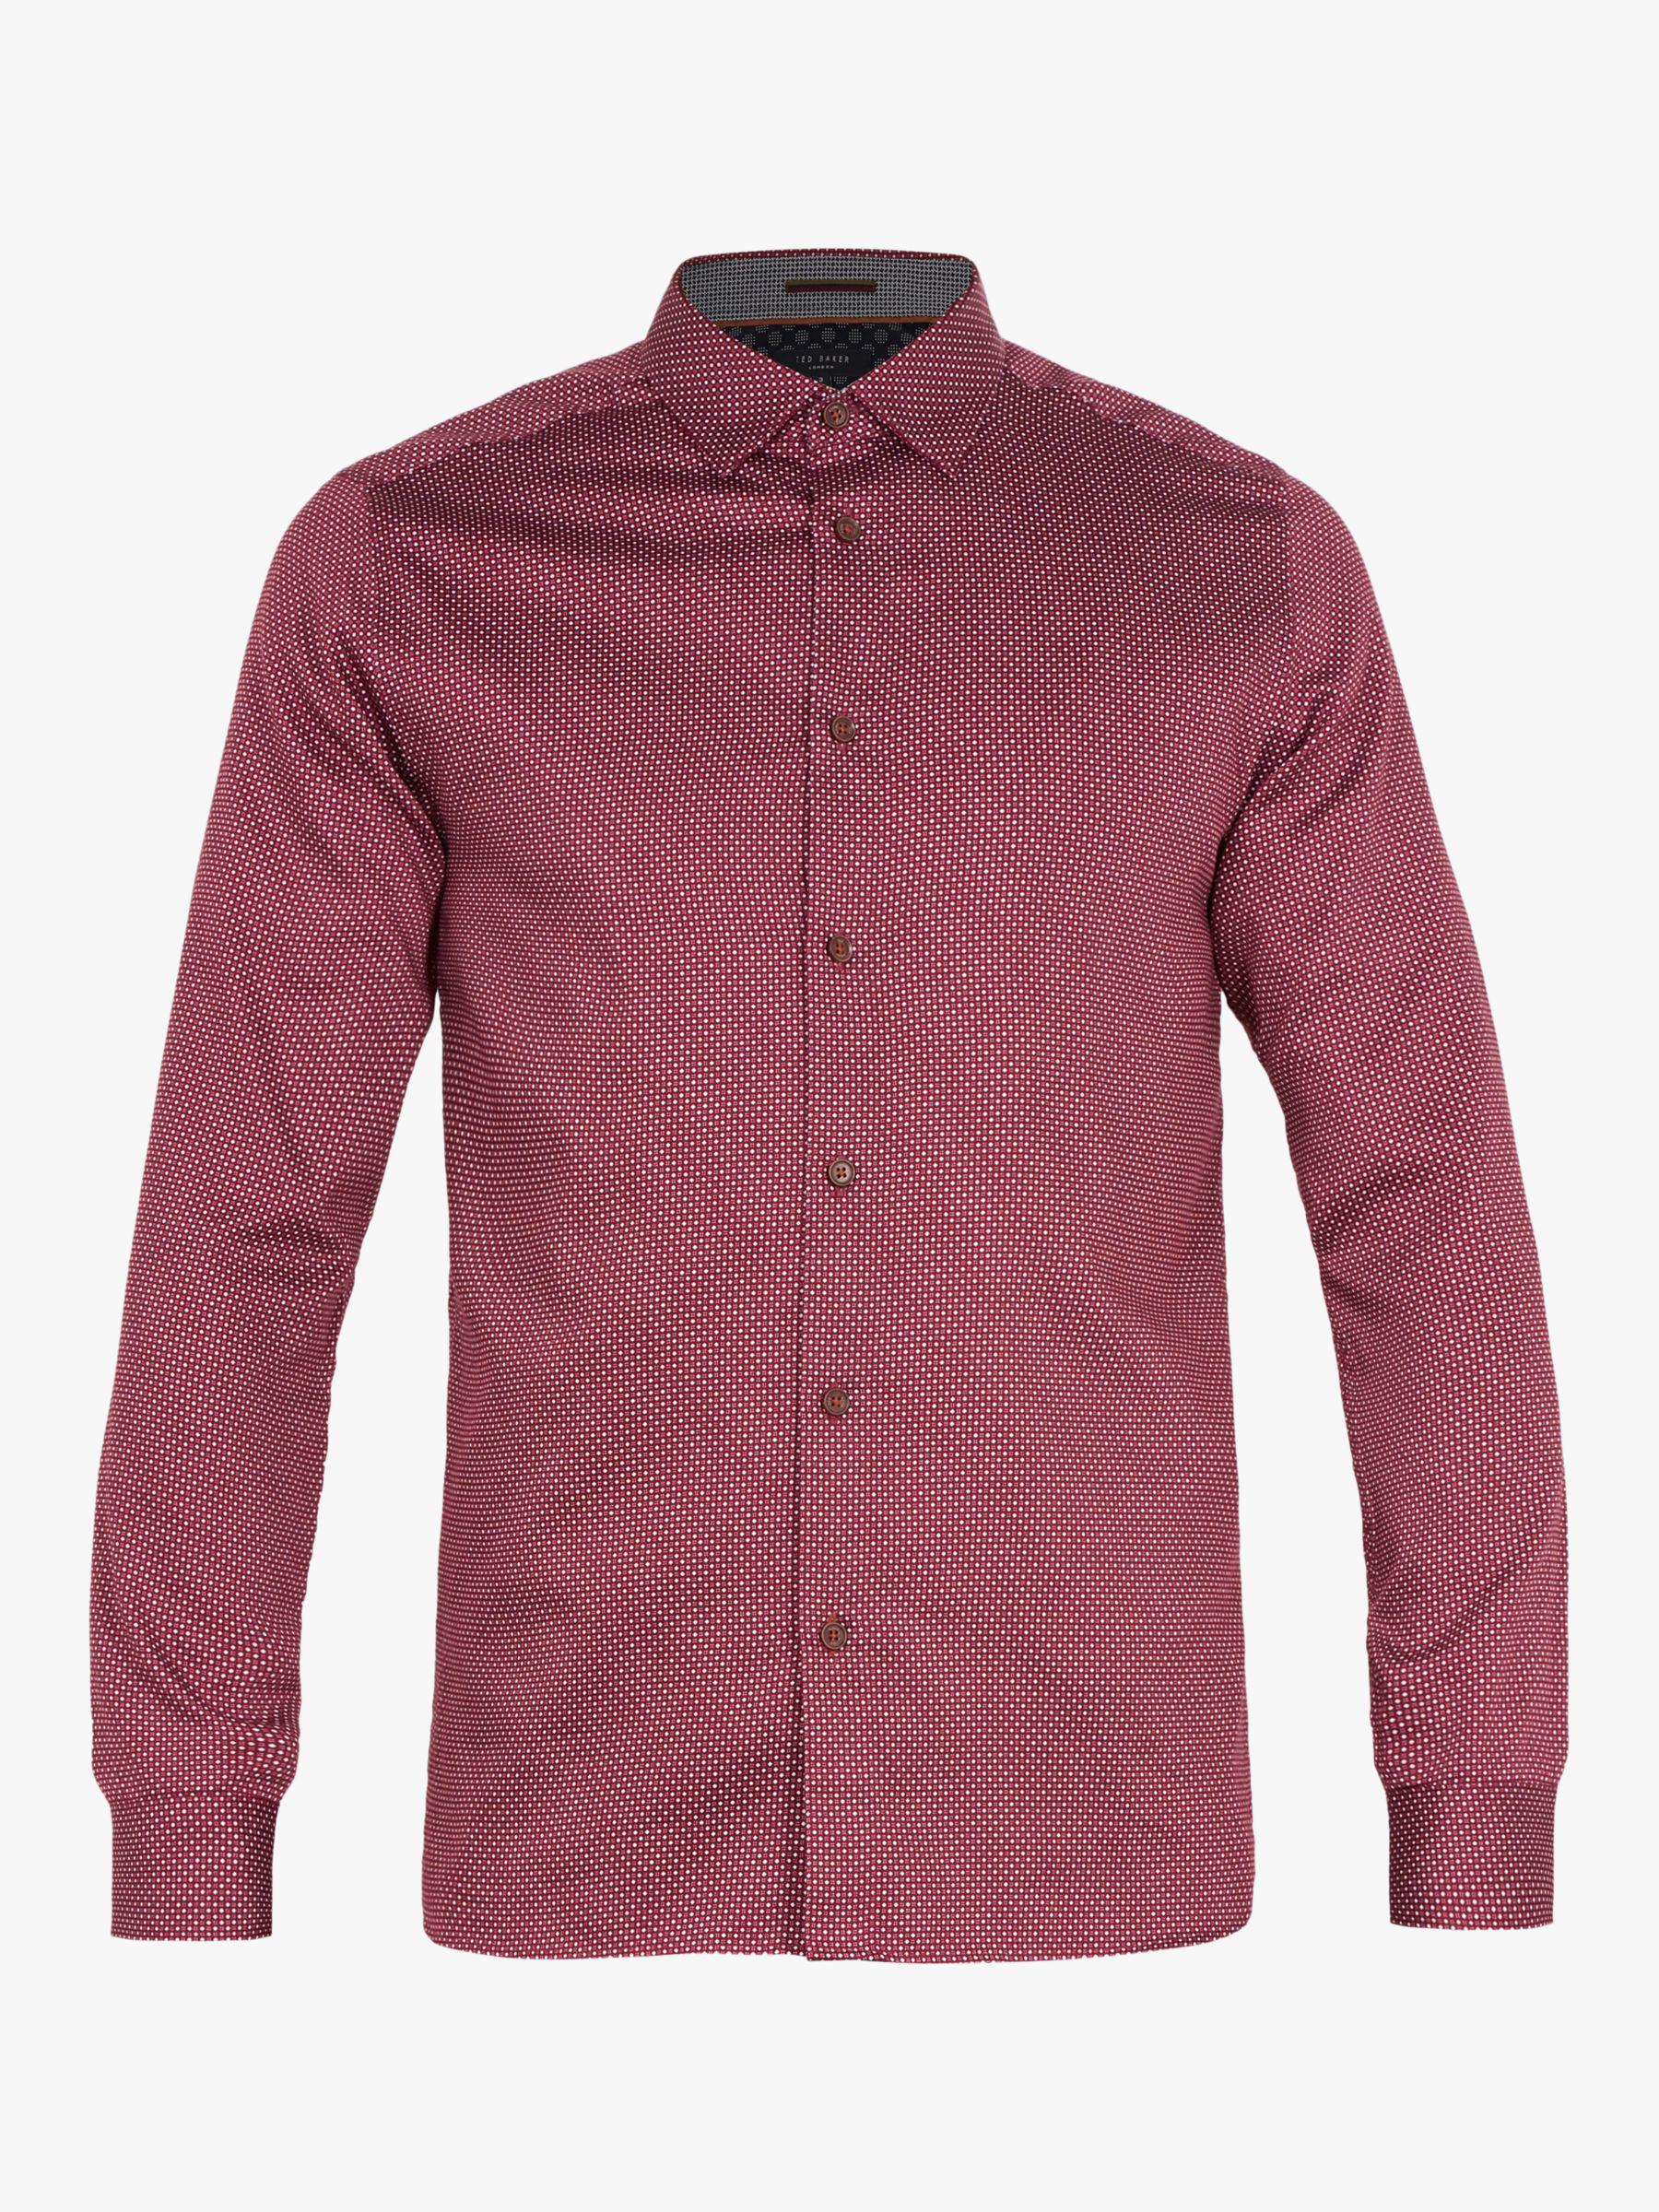 336889d10 Ted Baker Subik Geo Print Slim Fit Shirt in Purple for Men - Lyst